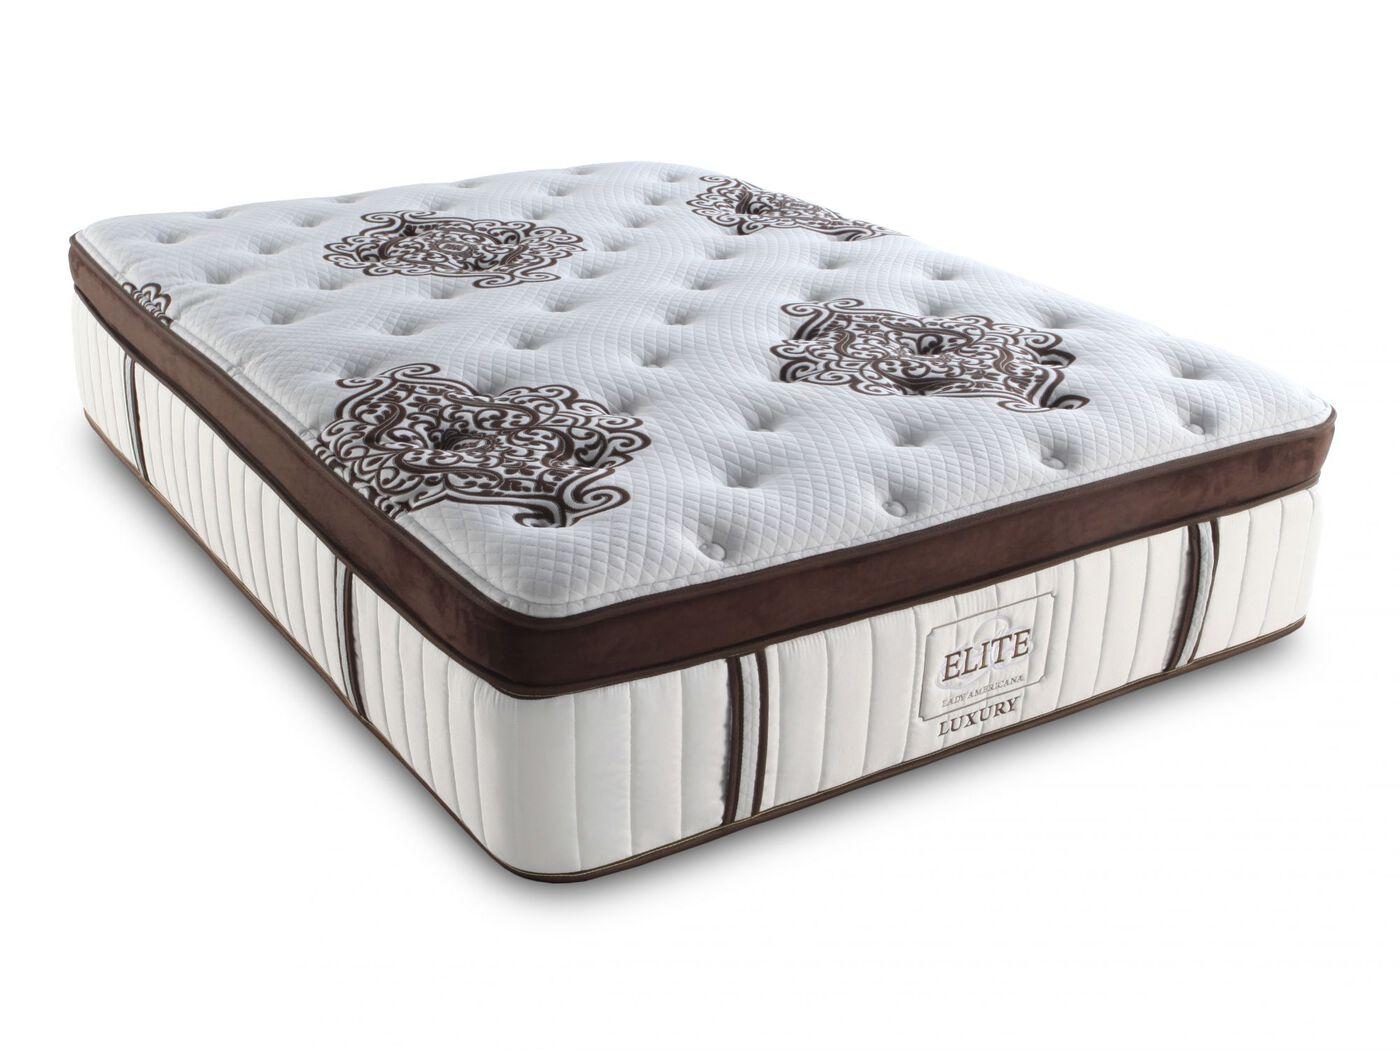 lady americana elite luxury resplendent mattress mathis brothers